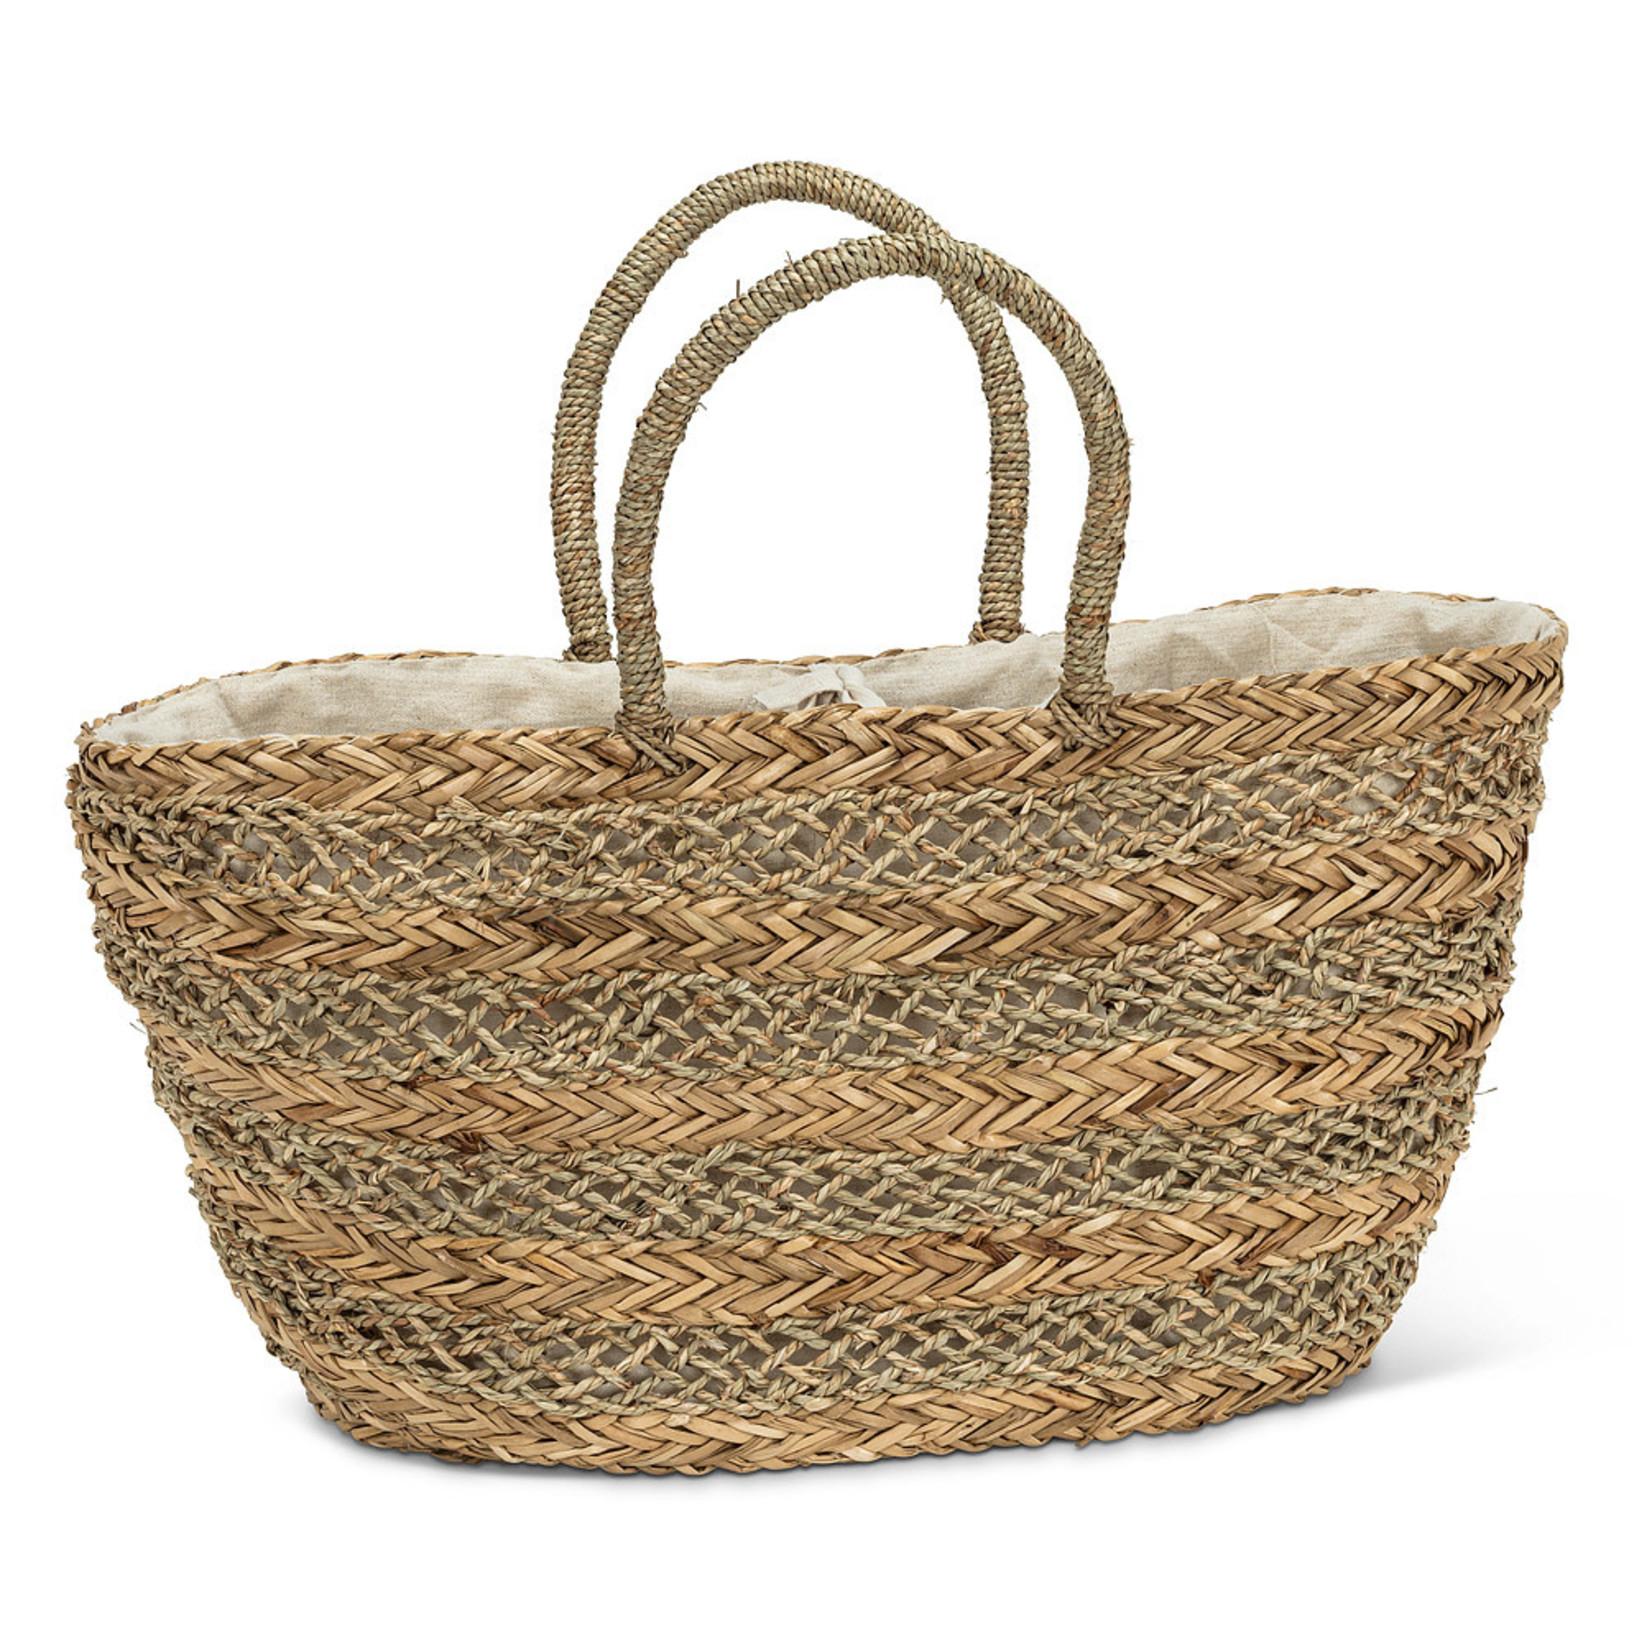 Abbott Abbott Woven Striped Market Bag